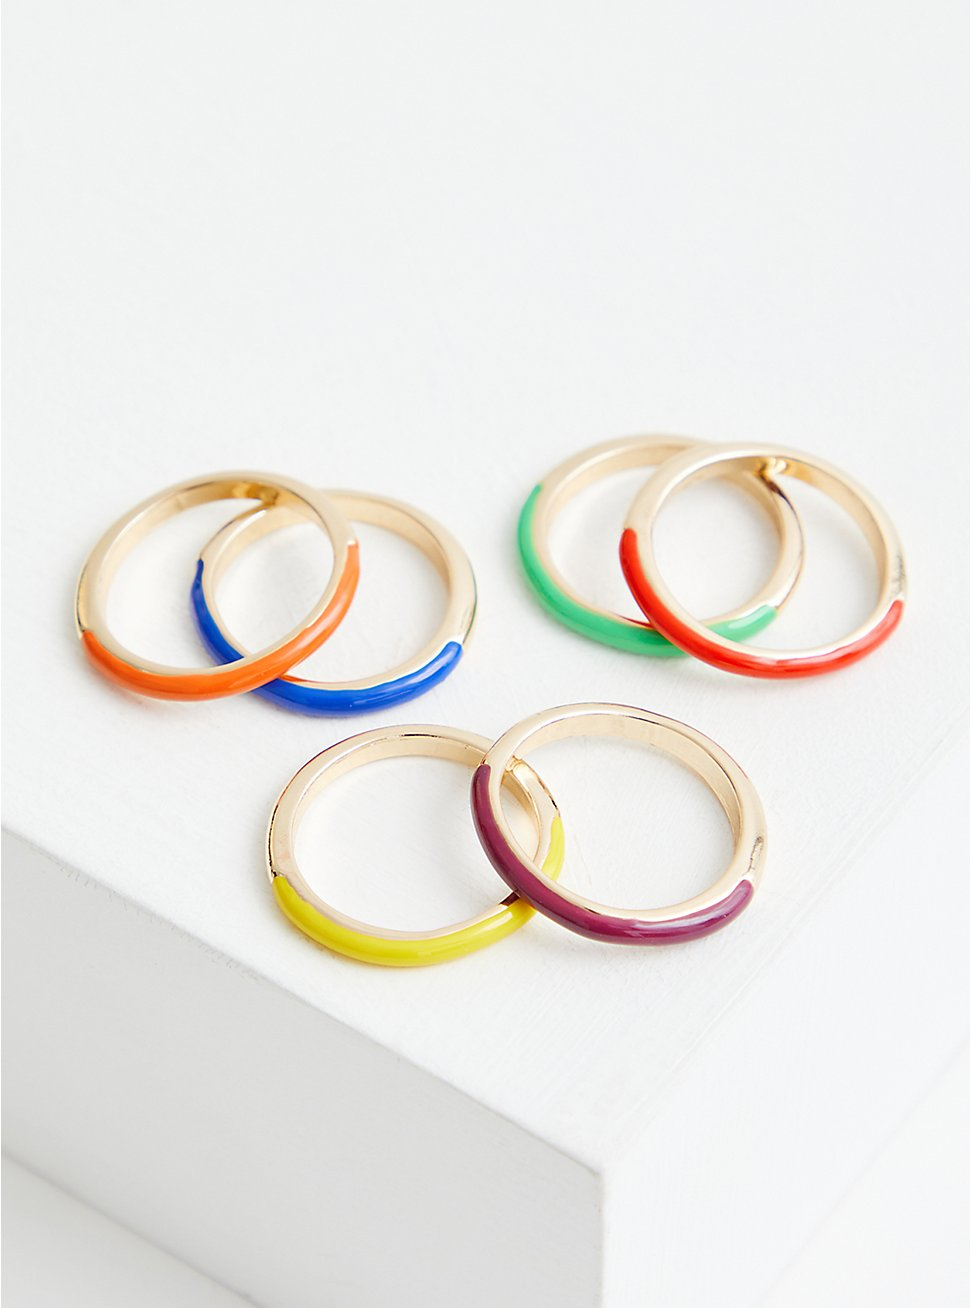 Celebrate Love Rainbow Enamel Ring Set Of 6 - Gold Tone, MULTI, hi-res